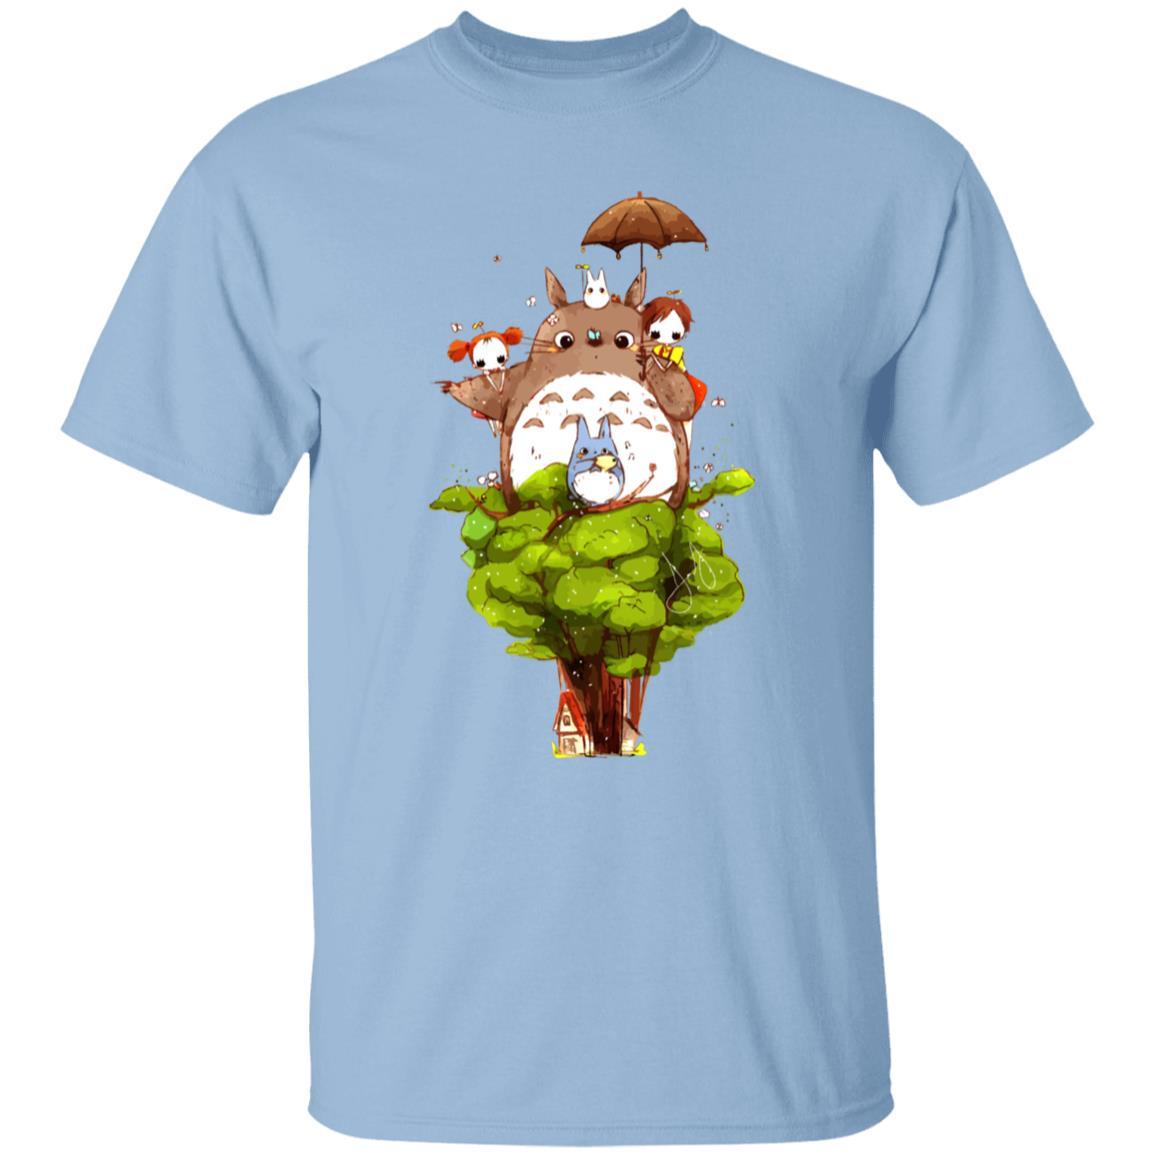 My Neighbor Totoro Characters cartoon Style T Shirt